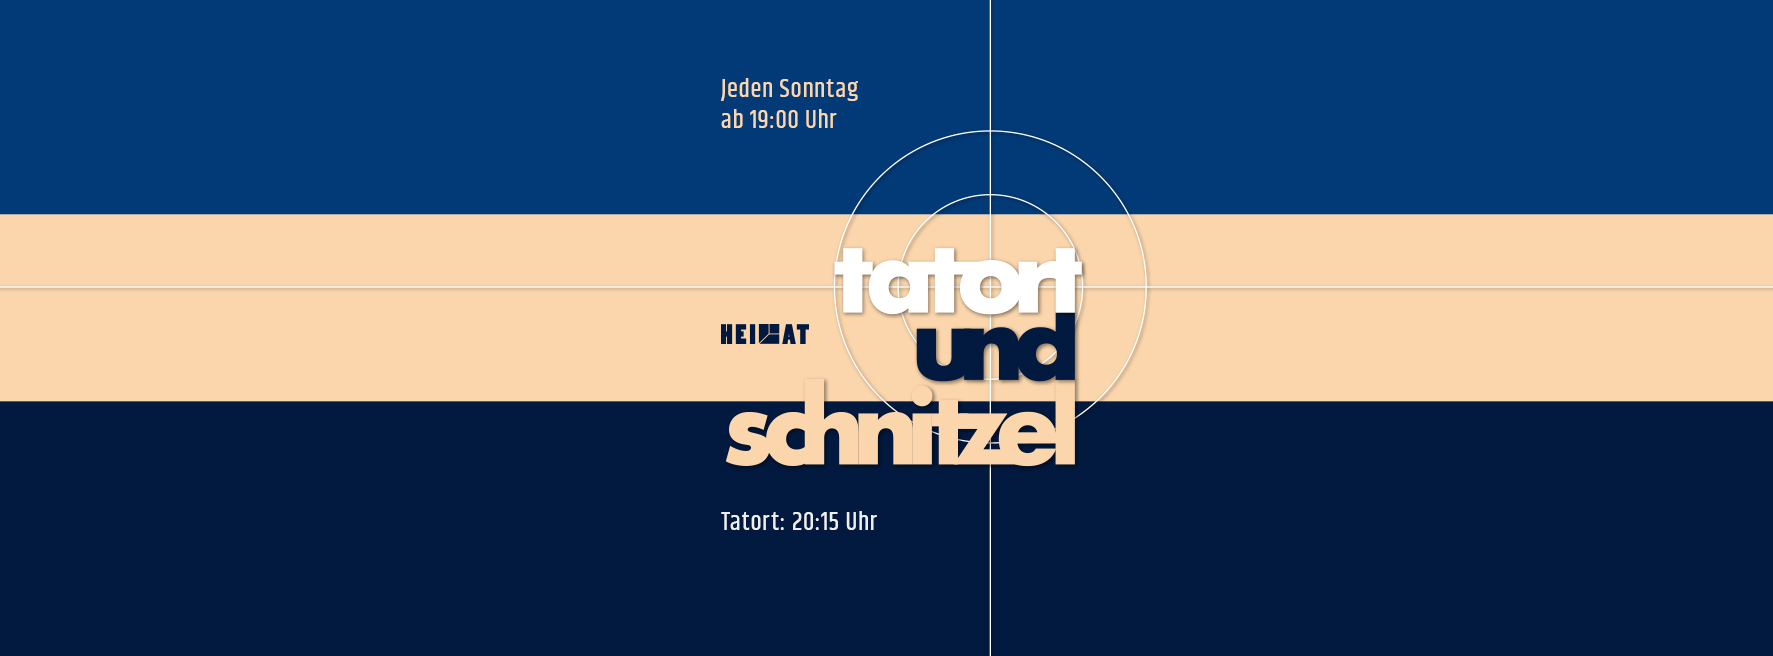 180900_TatortUndSchnitzel_FB2.jpg